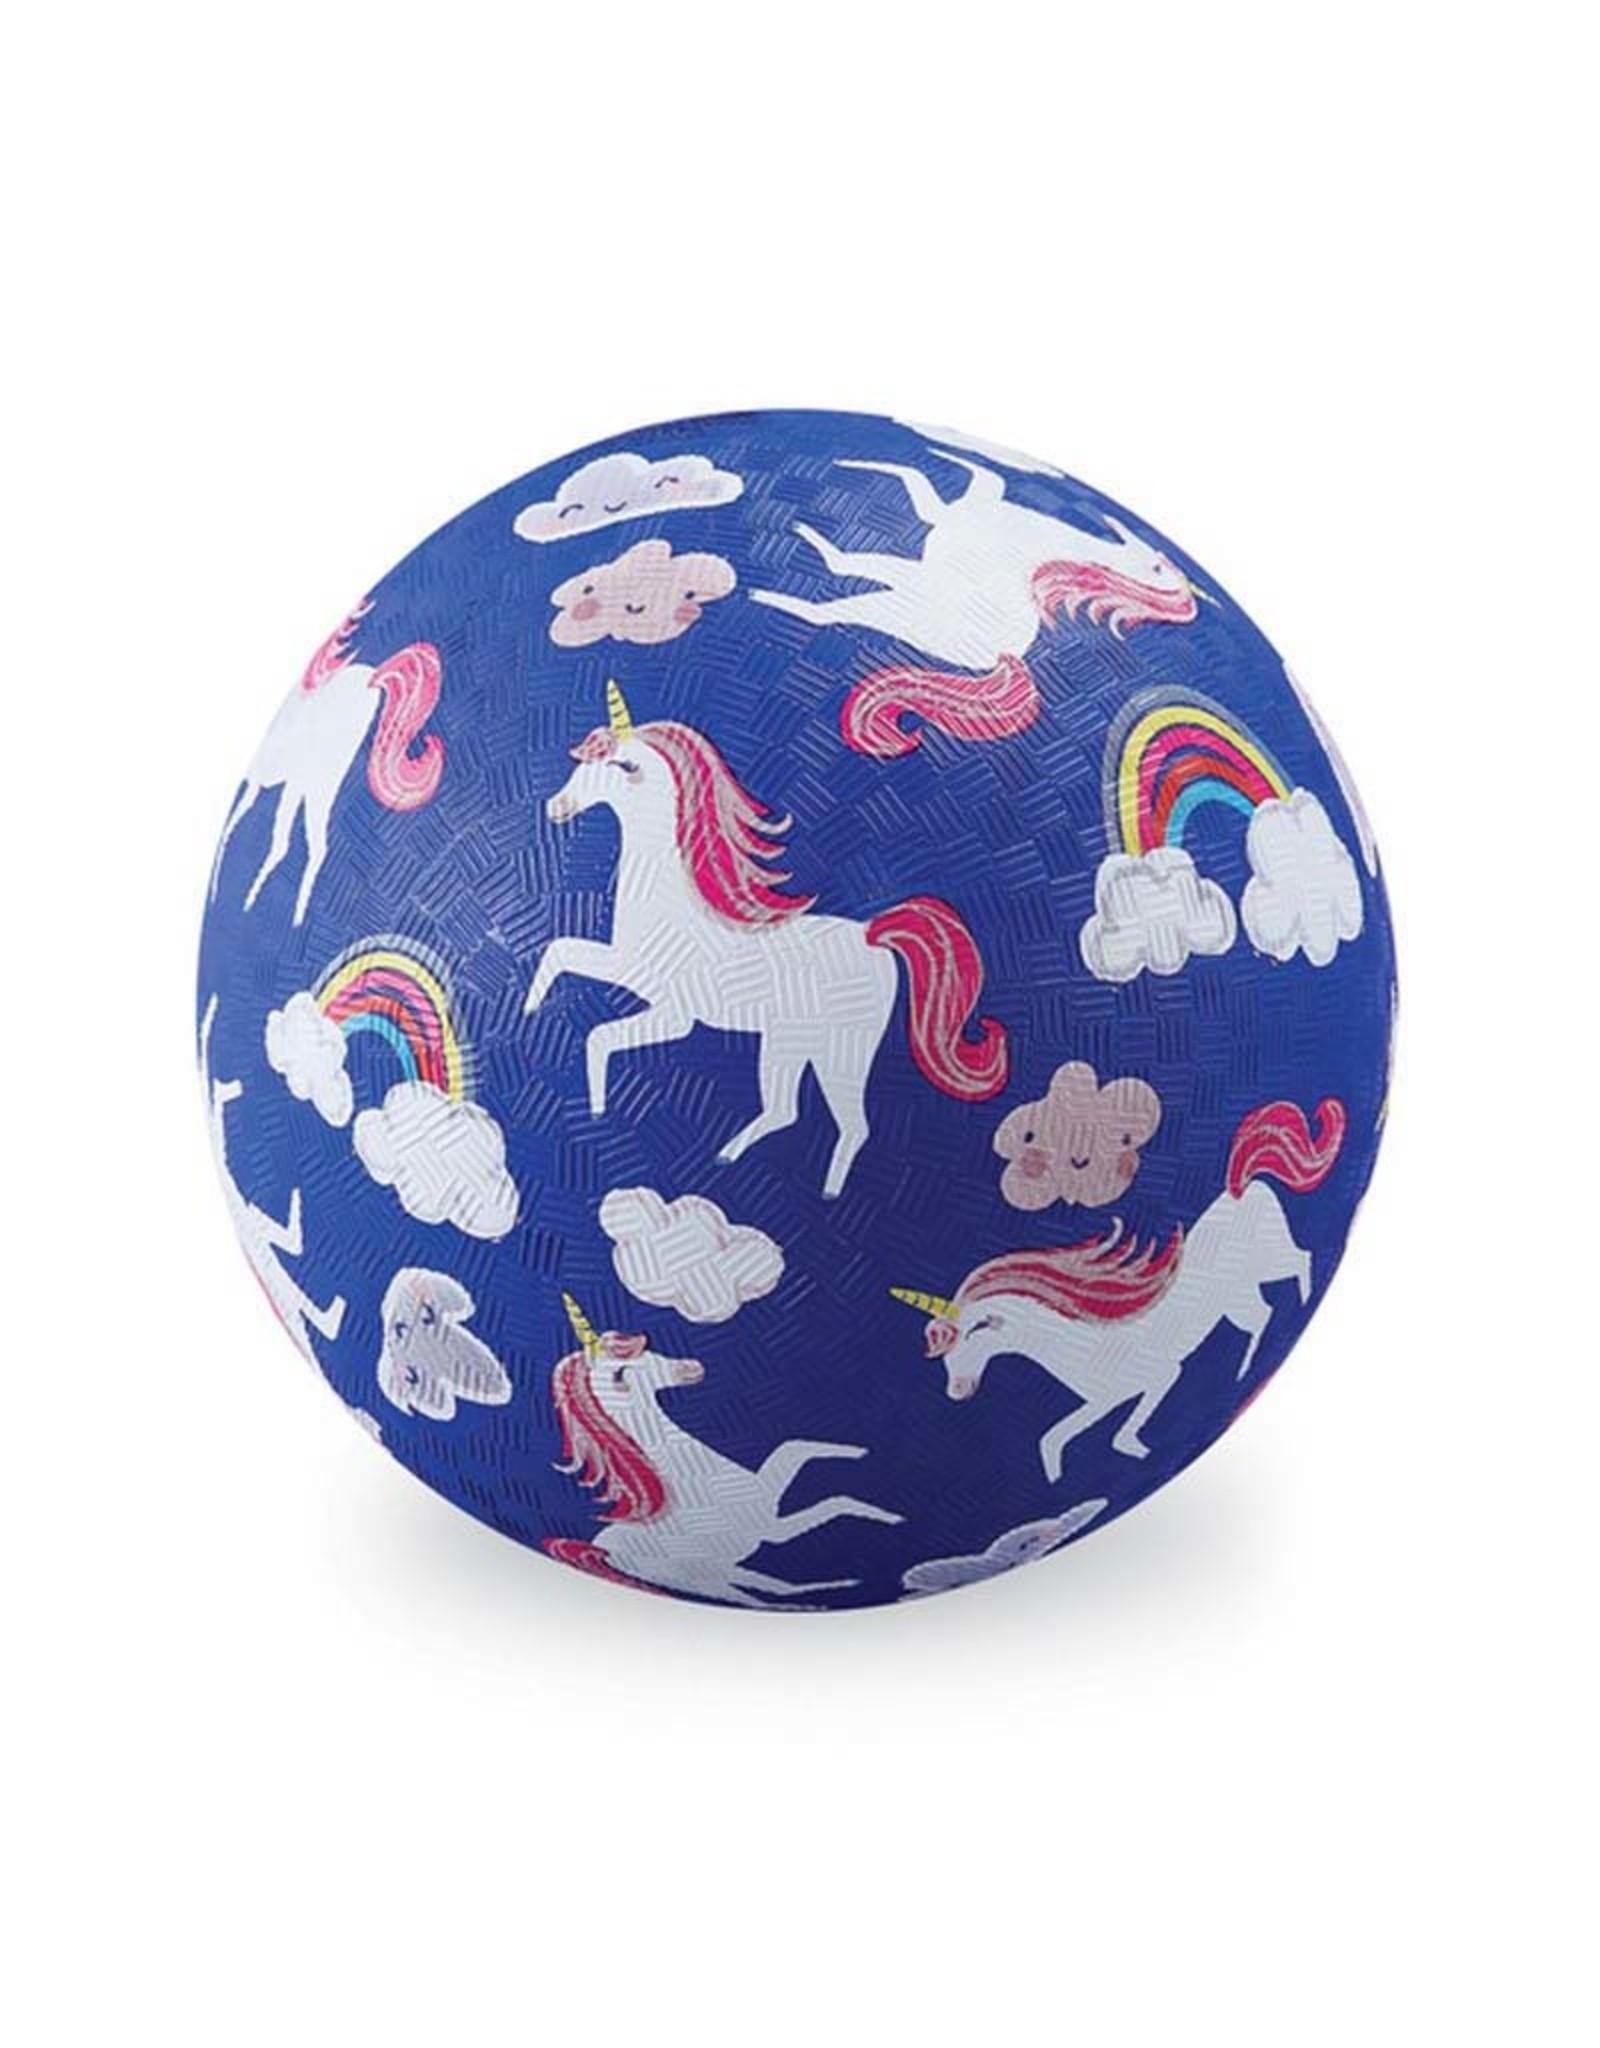 "Crocodile Creek 7"" Playground Ball/ Unicorn NEW!"